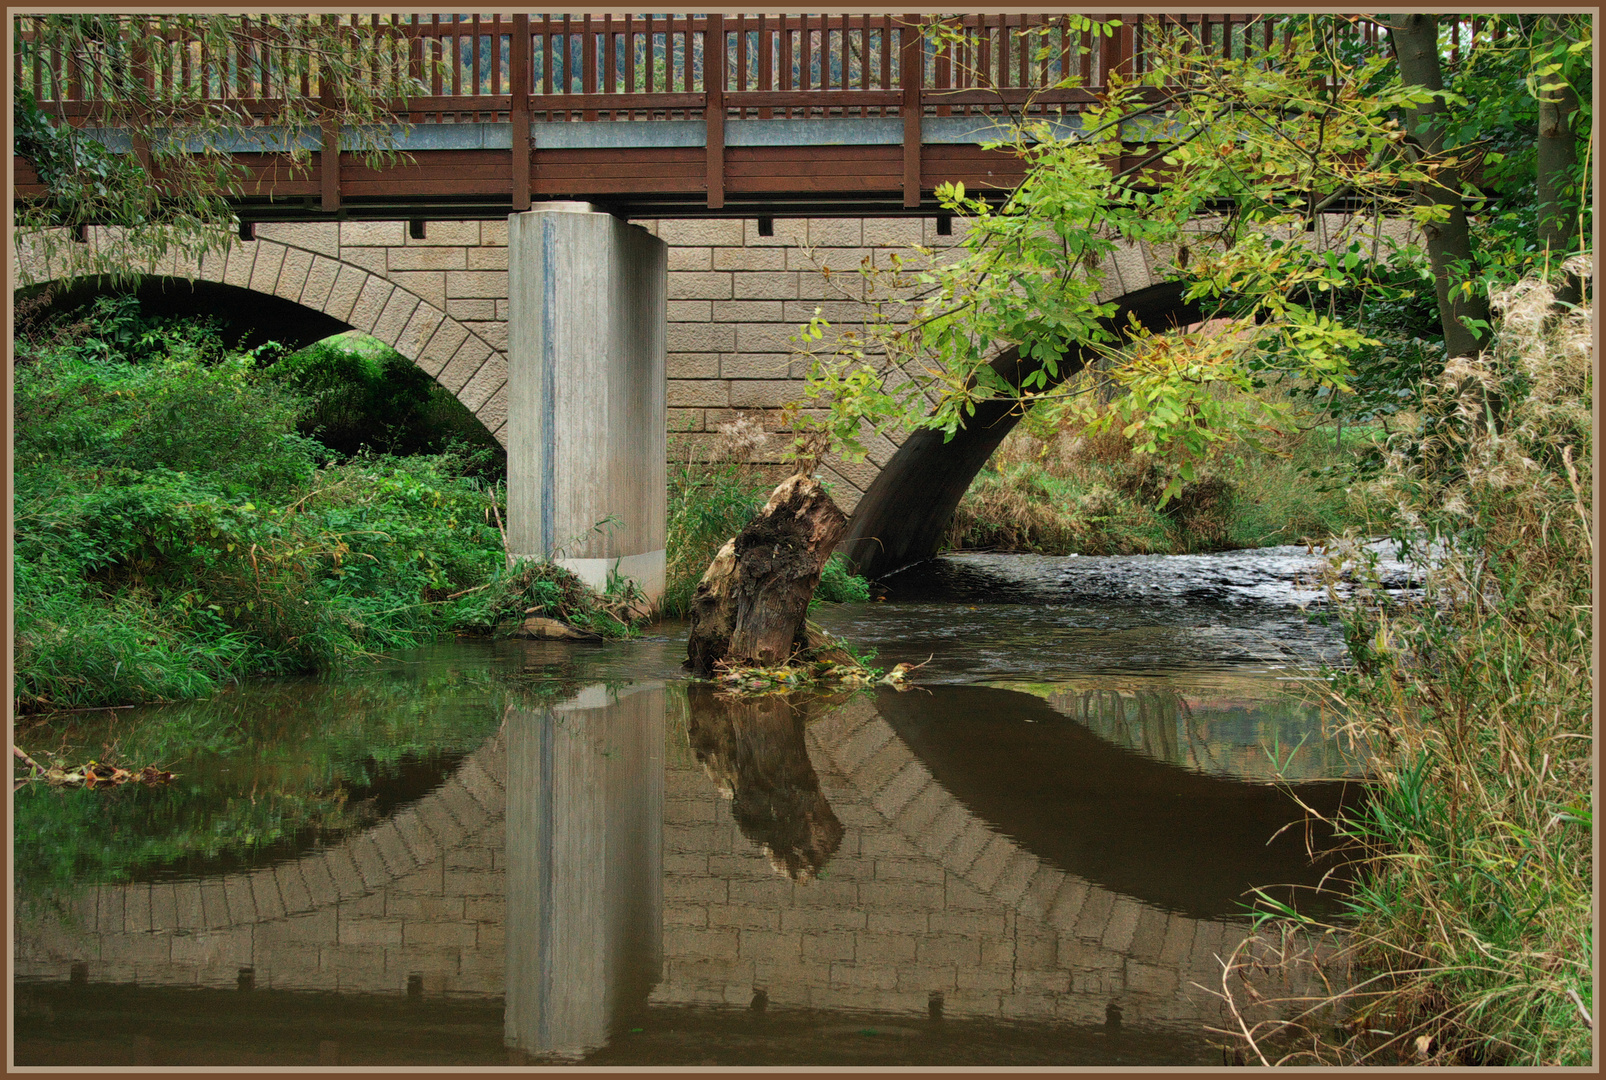 Wipper-Brücke